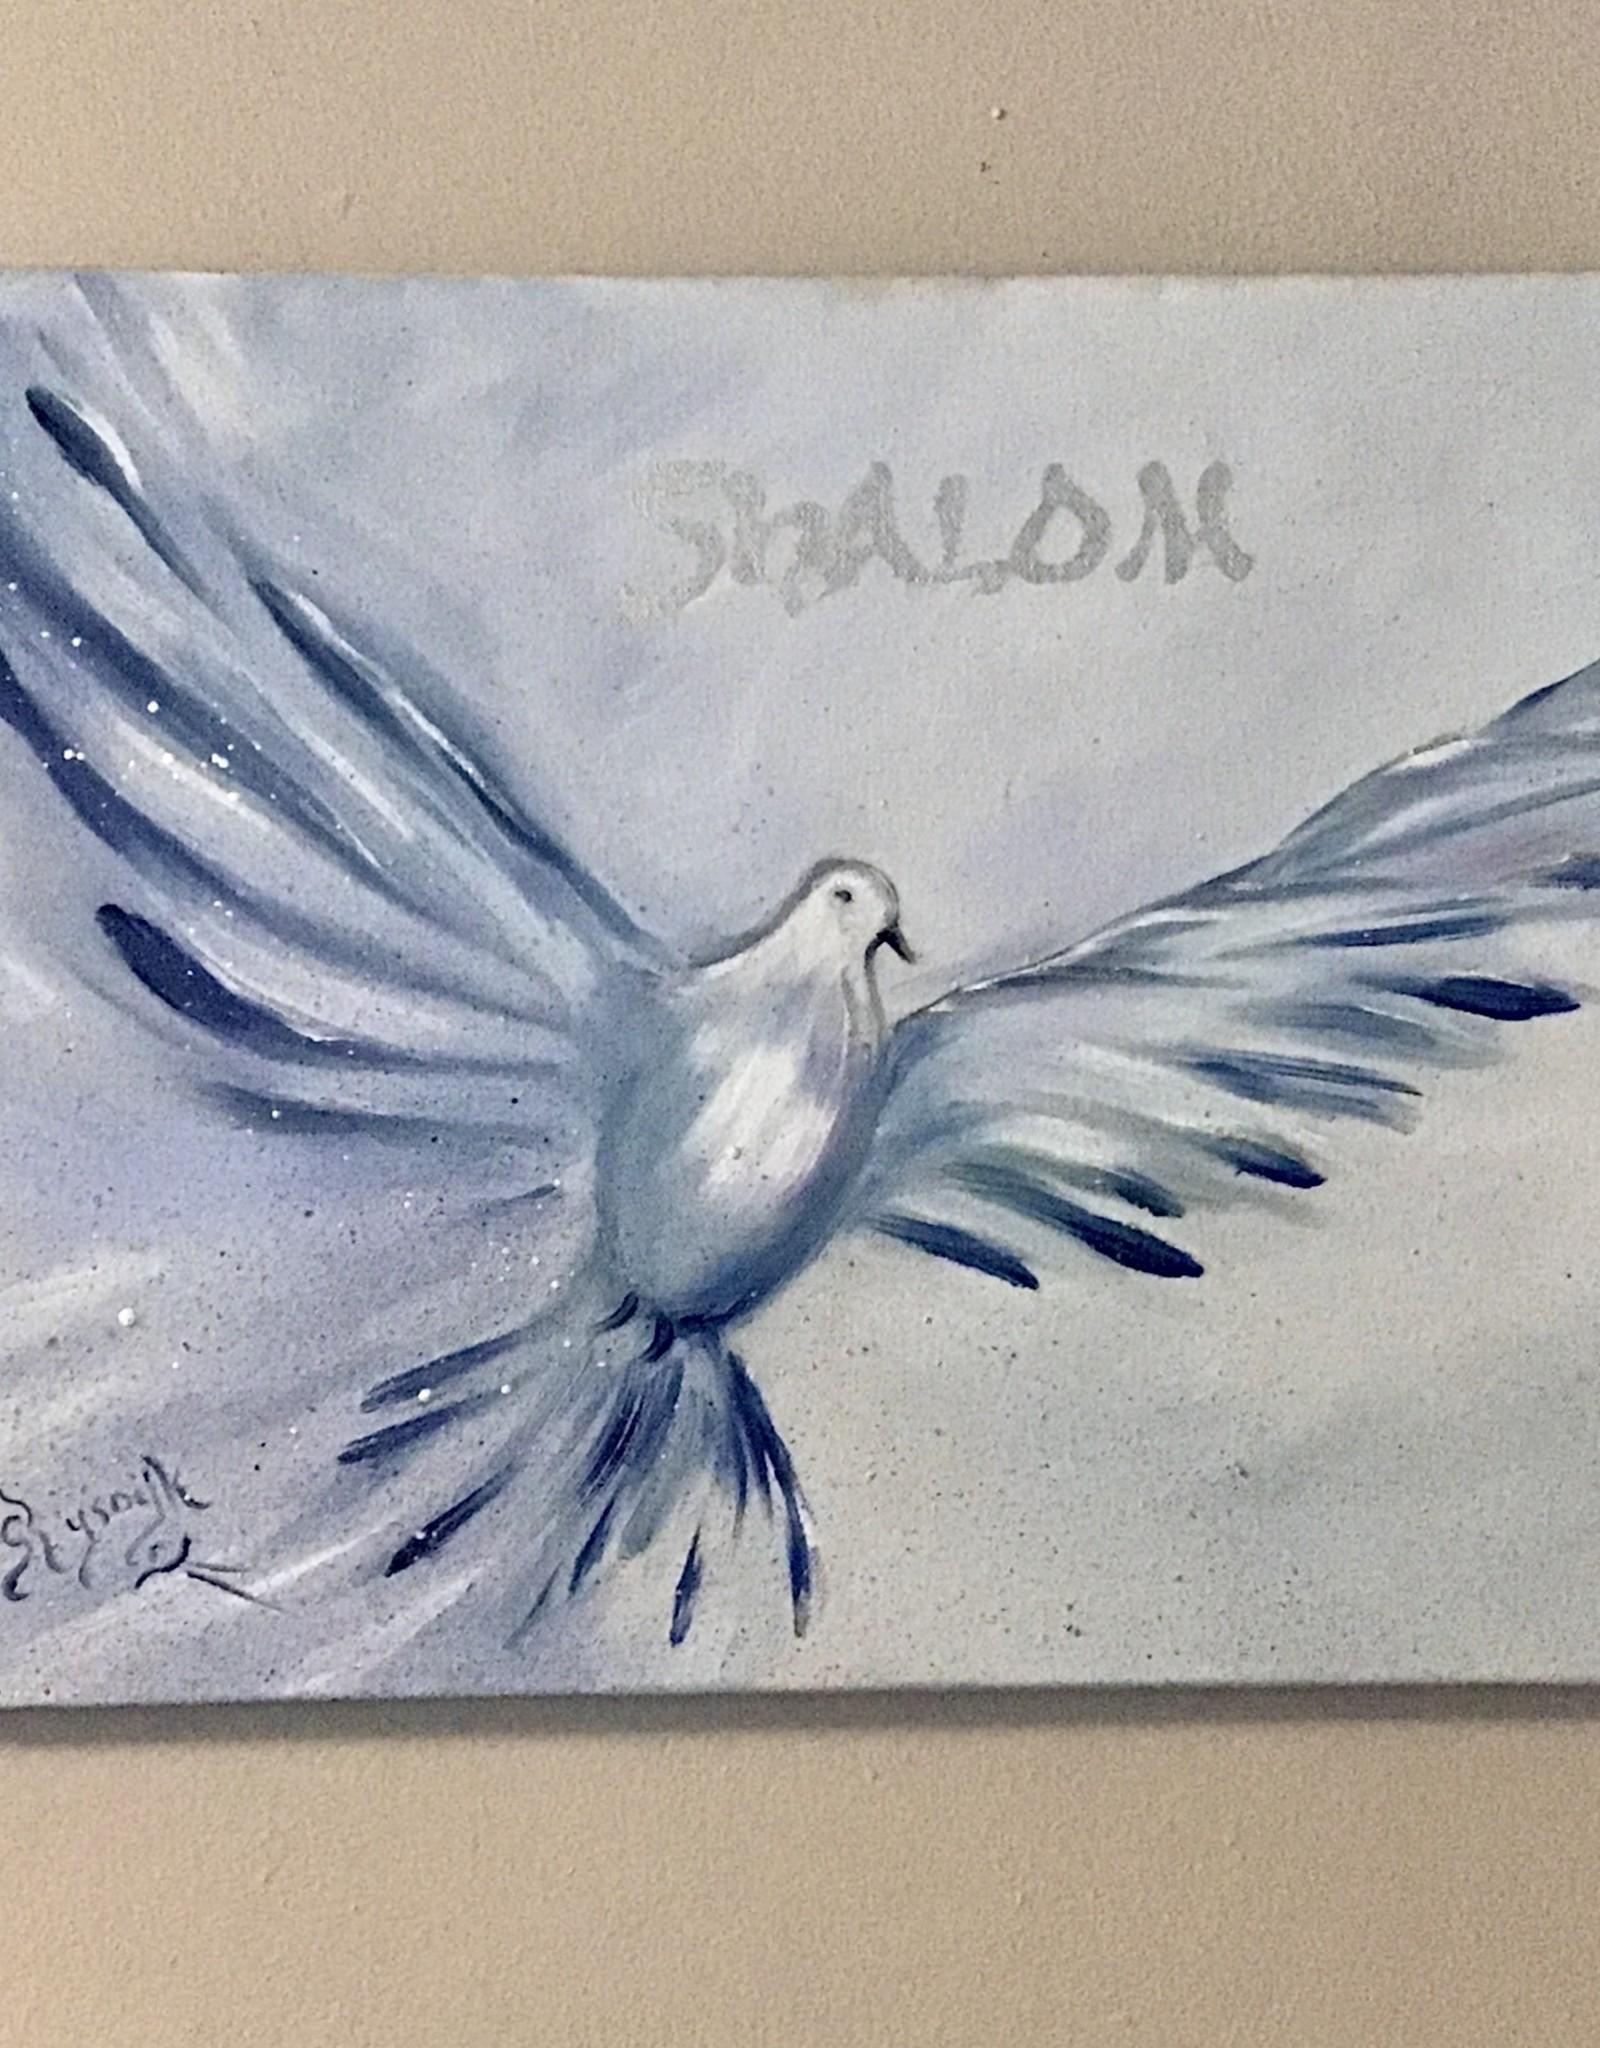 Chaipainter Shalom in blauw en zilver